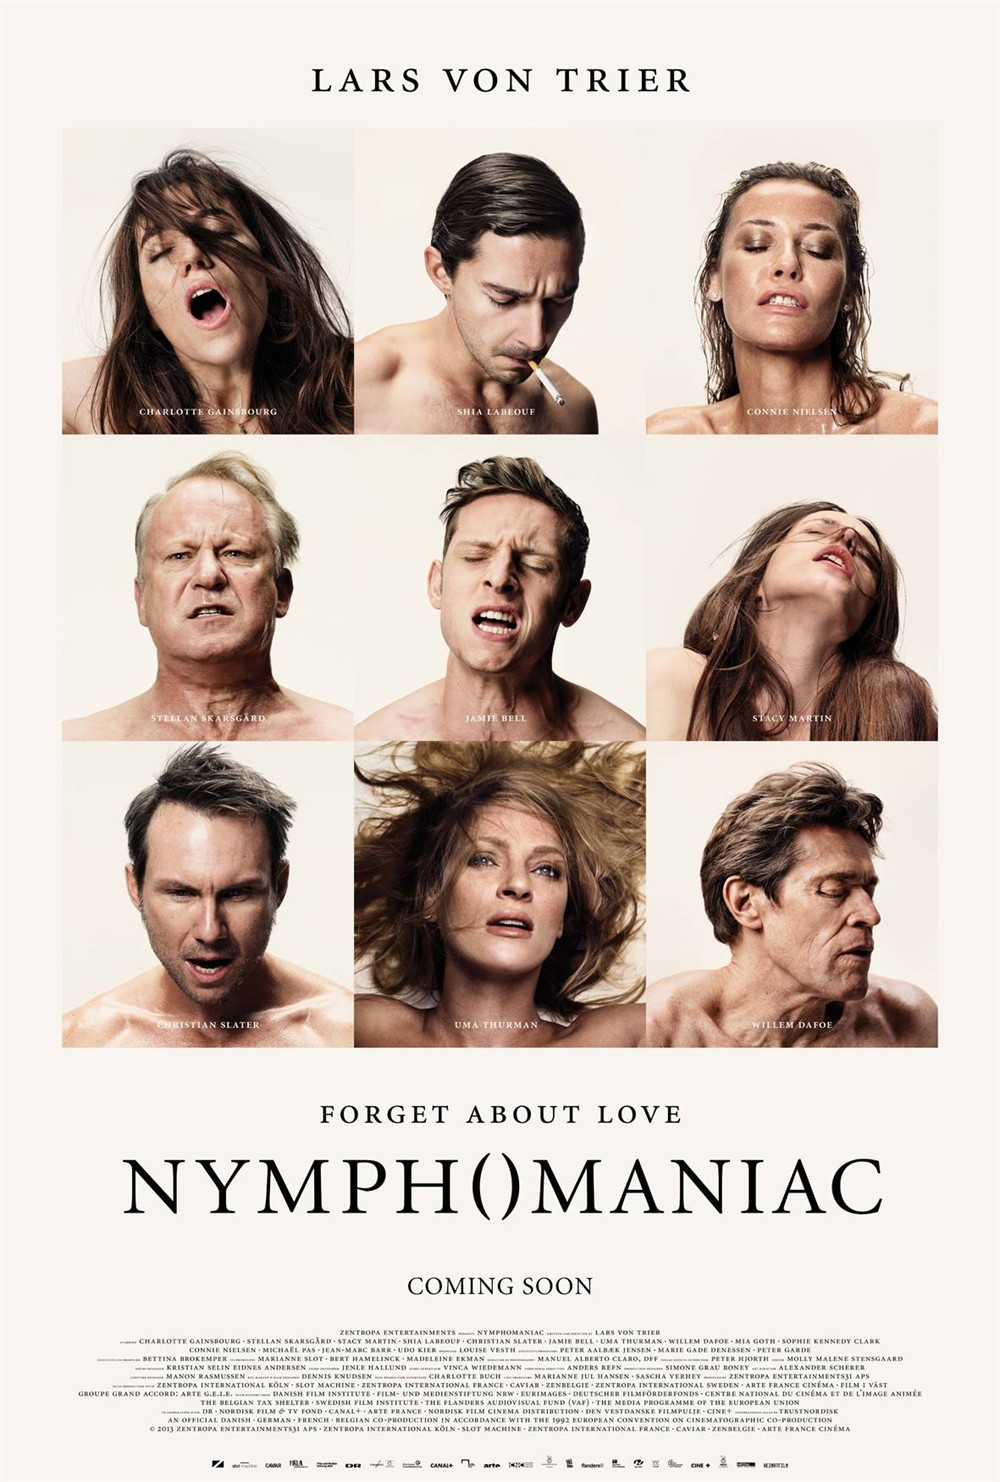 NYMPHOMANIAC фильм Кристиан Слейтер ума Турман Шелковый плакат декоративной живописи 24x36 дюймов - Цвет: Белый